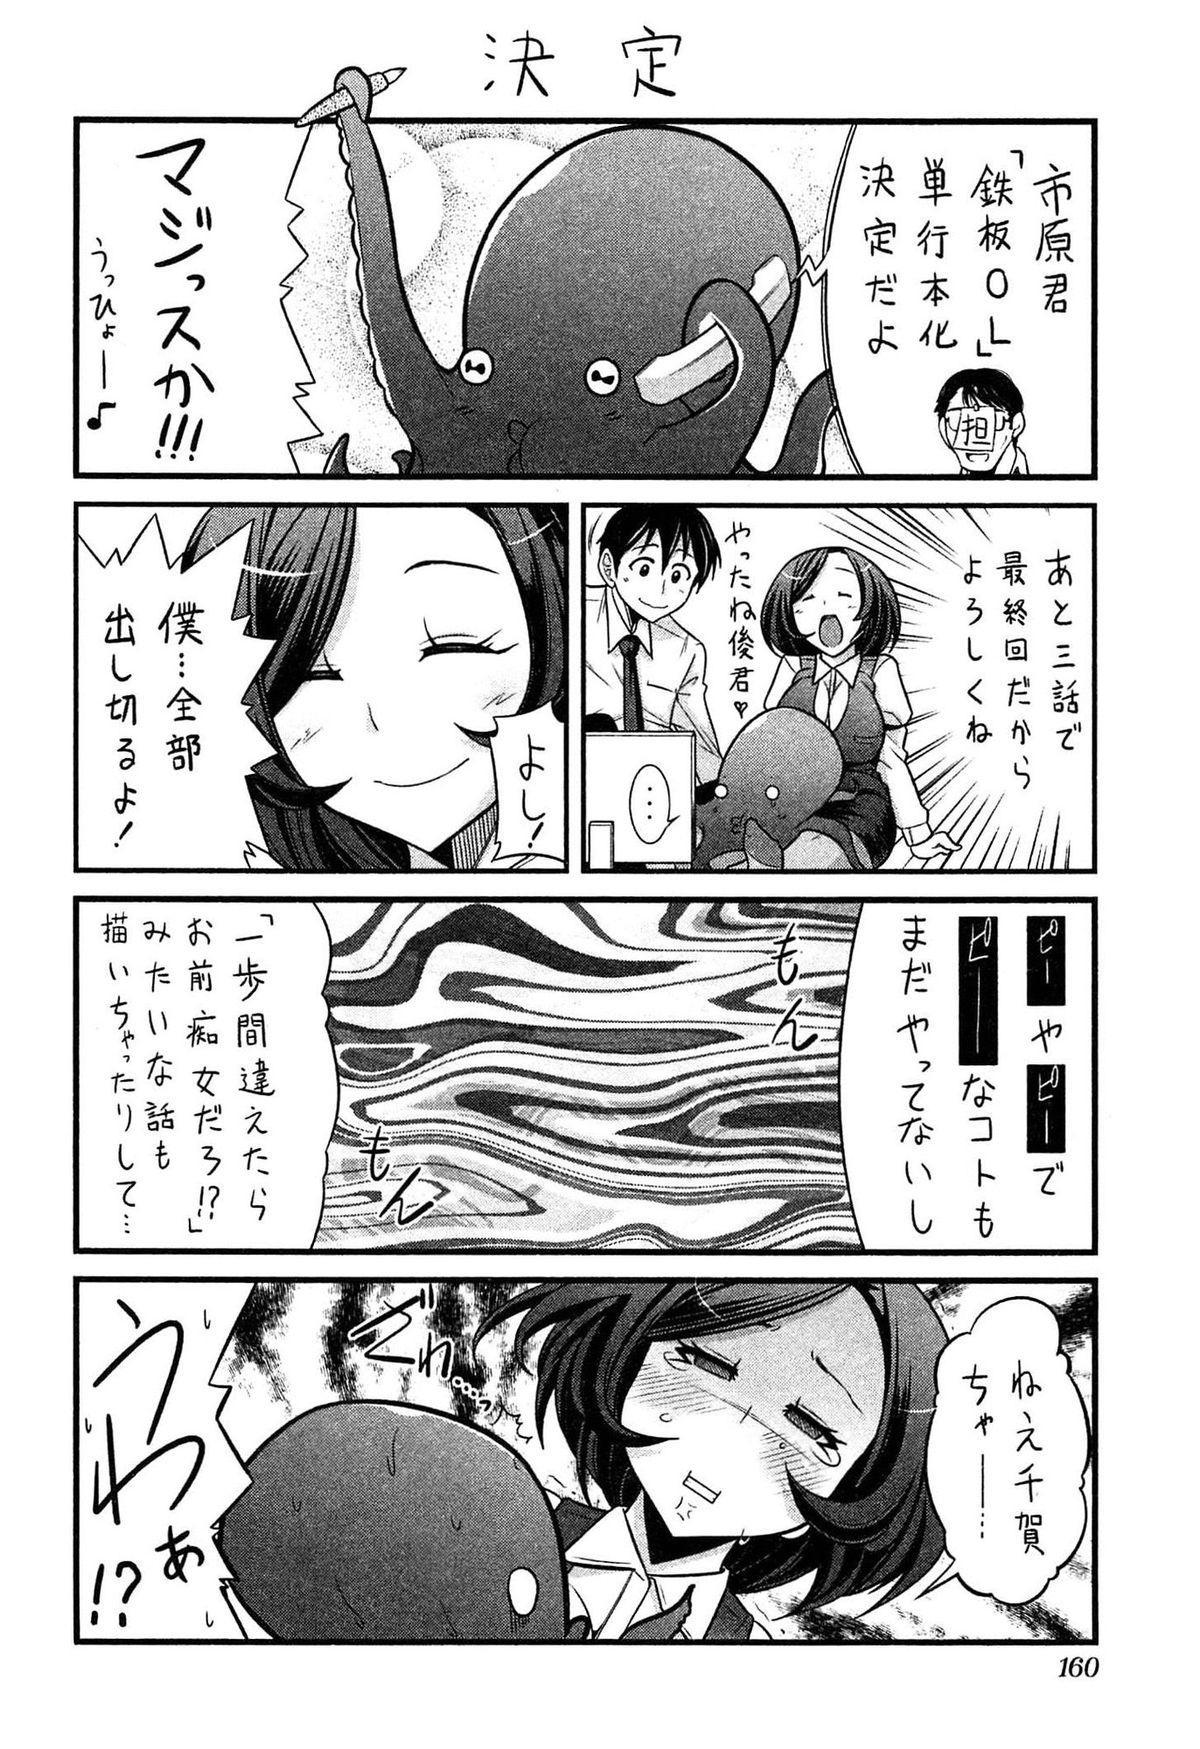 Teppan OL Chiga-san 163